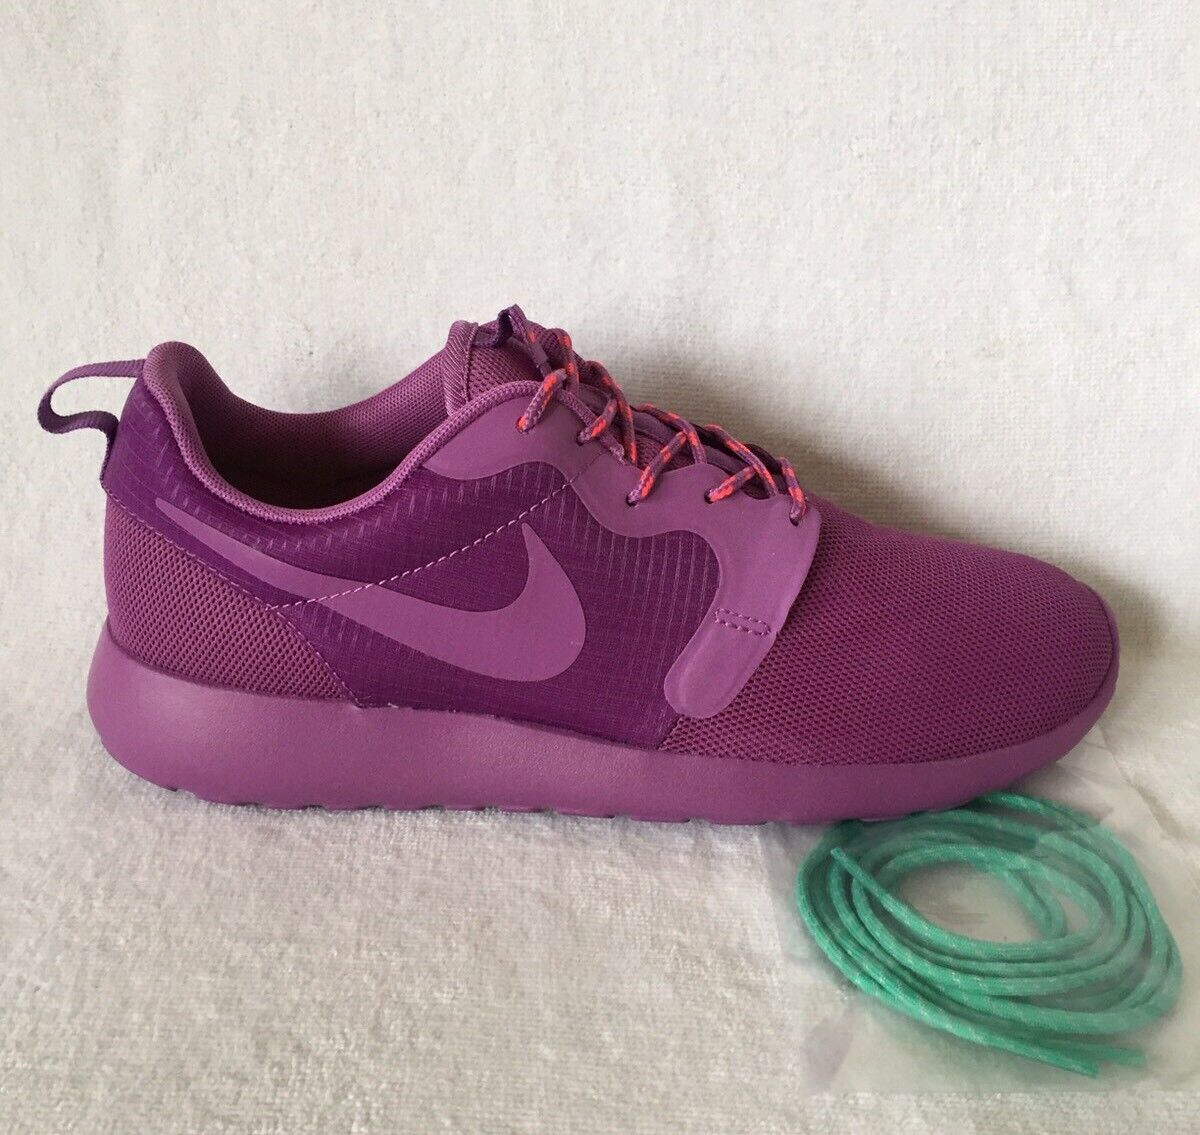 Nike Rosherun Hyperfuse 6 Size 6 Hyperfuse (uk) BNIB 2f871d